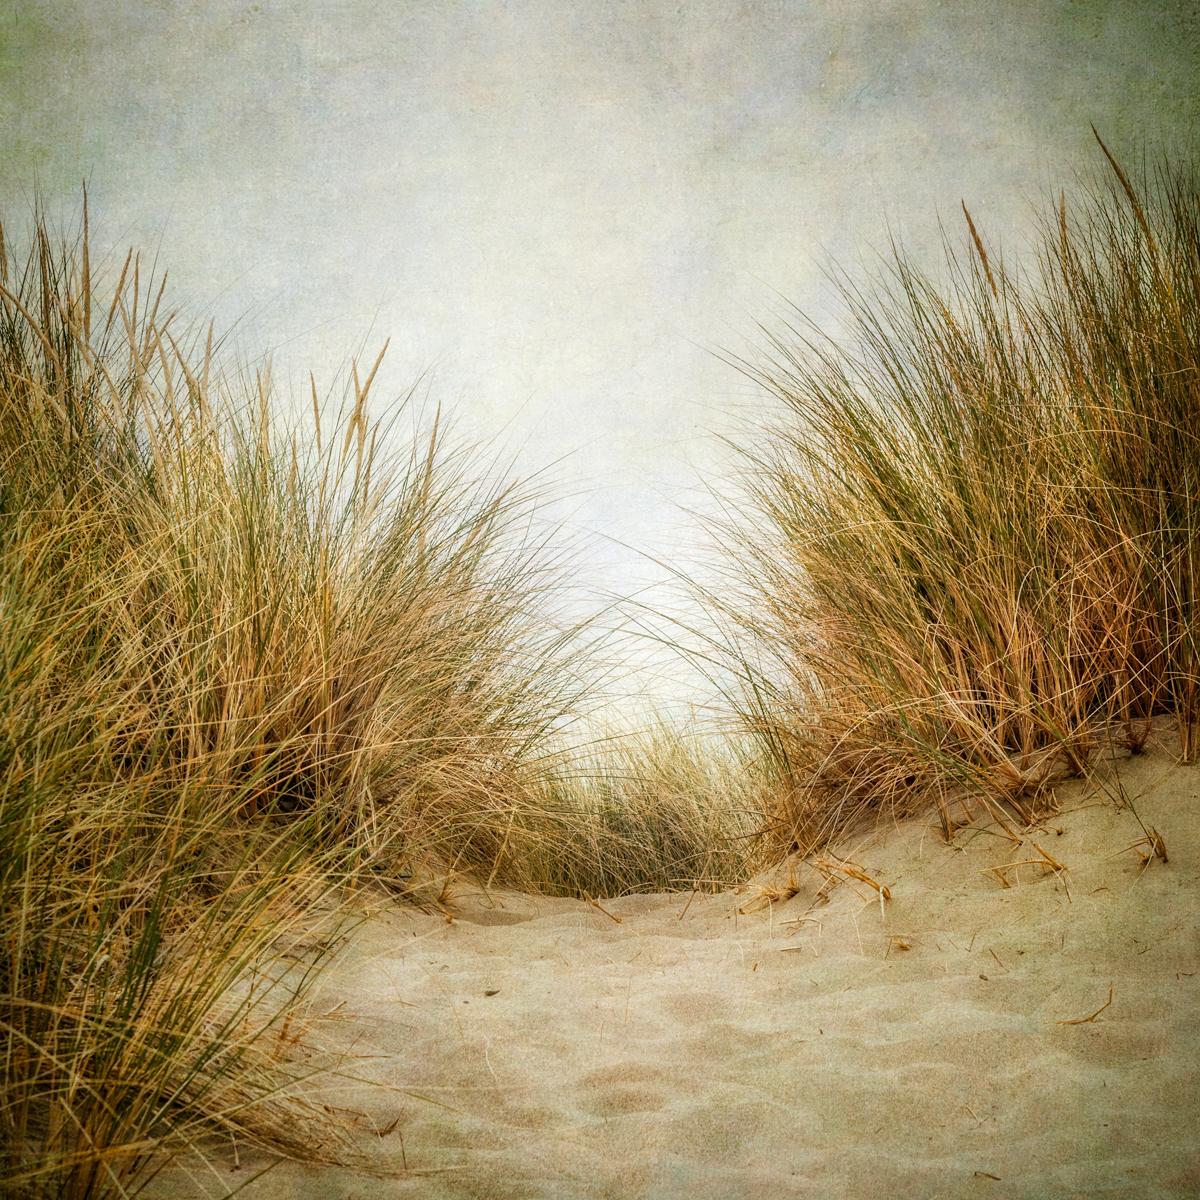 Beach Grass I (large view)